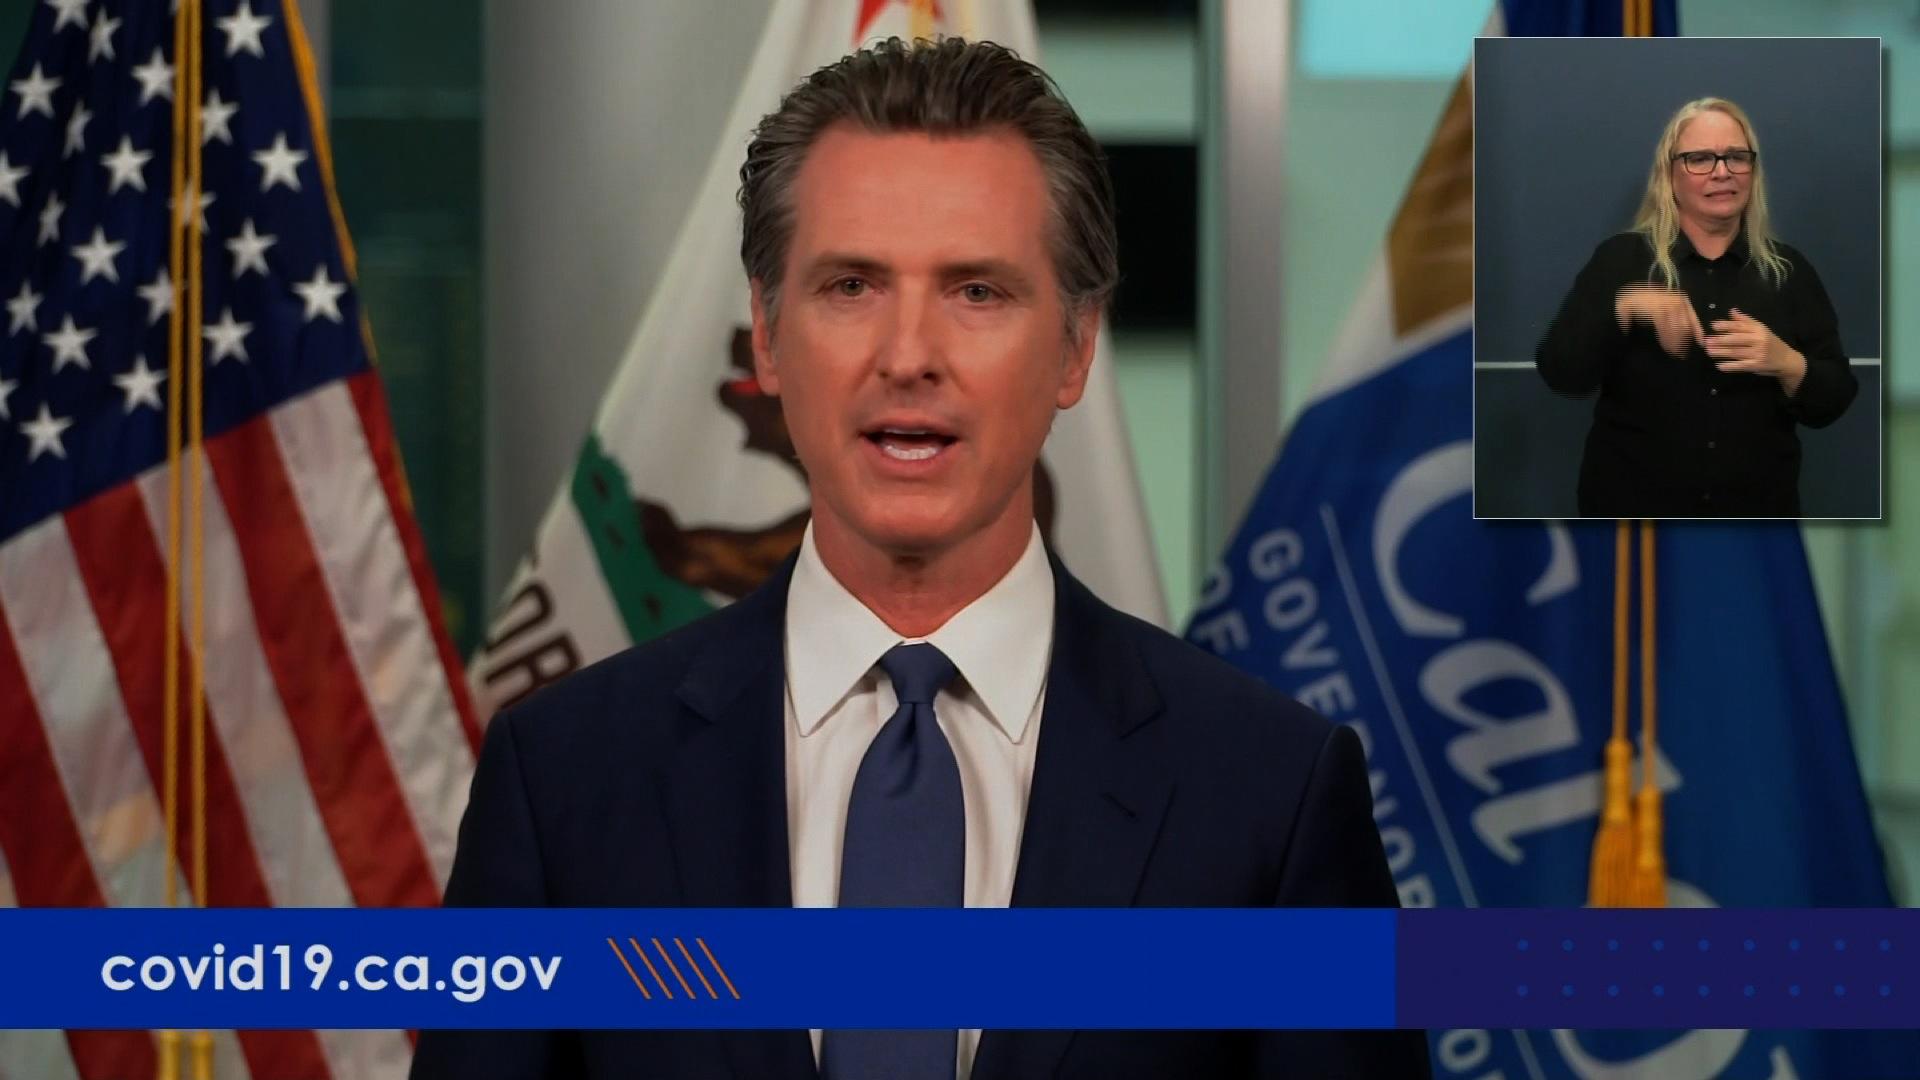 California Gov. Gavin Newsom speaks during a press conference on July 1.